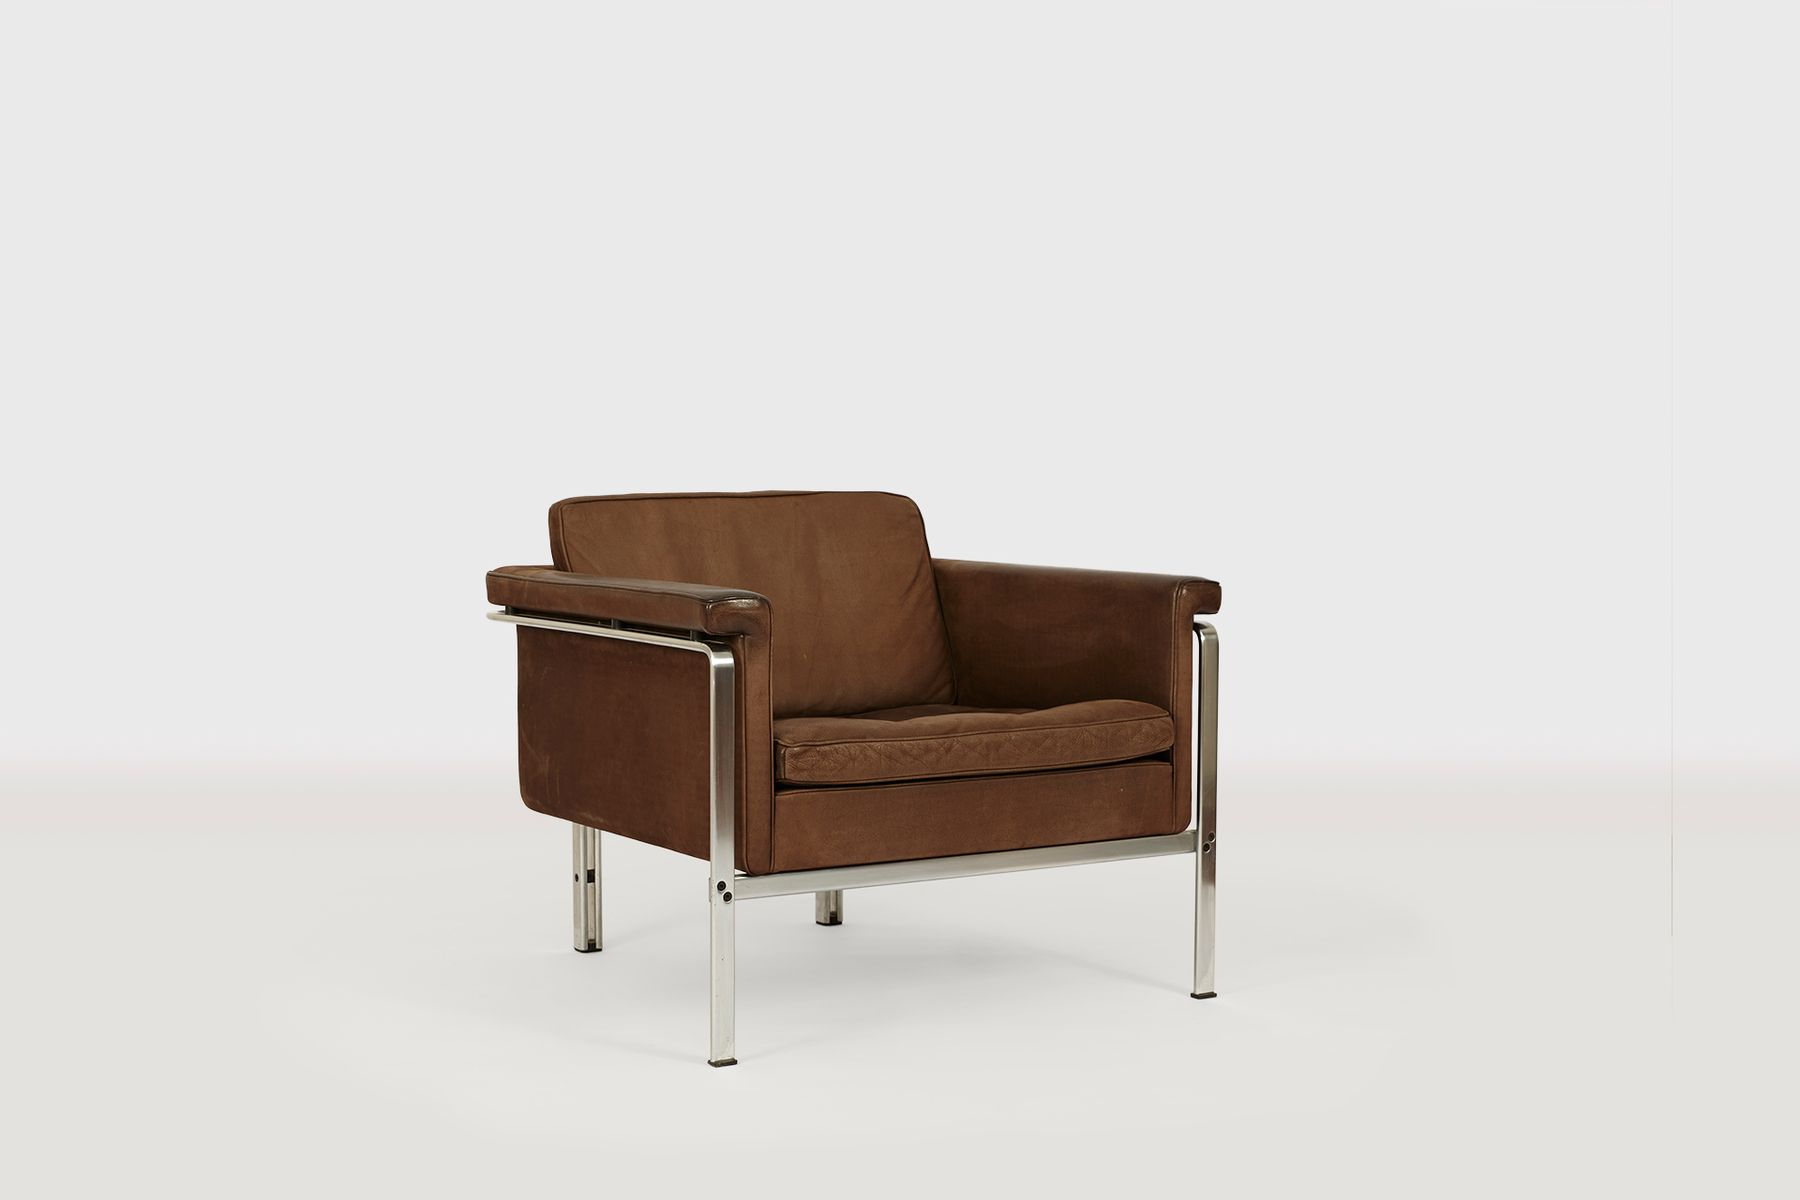 6911 Sessel von Horst Brüning für Kill International, 1960er